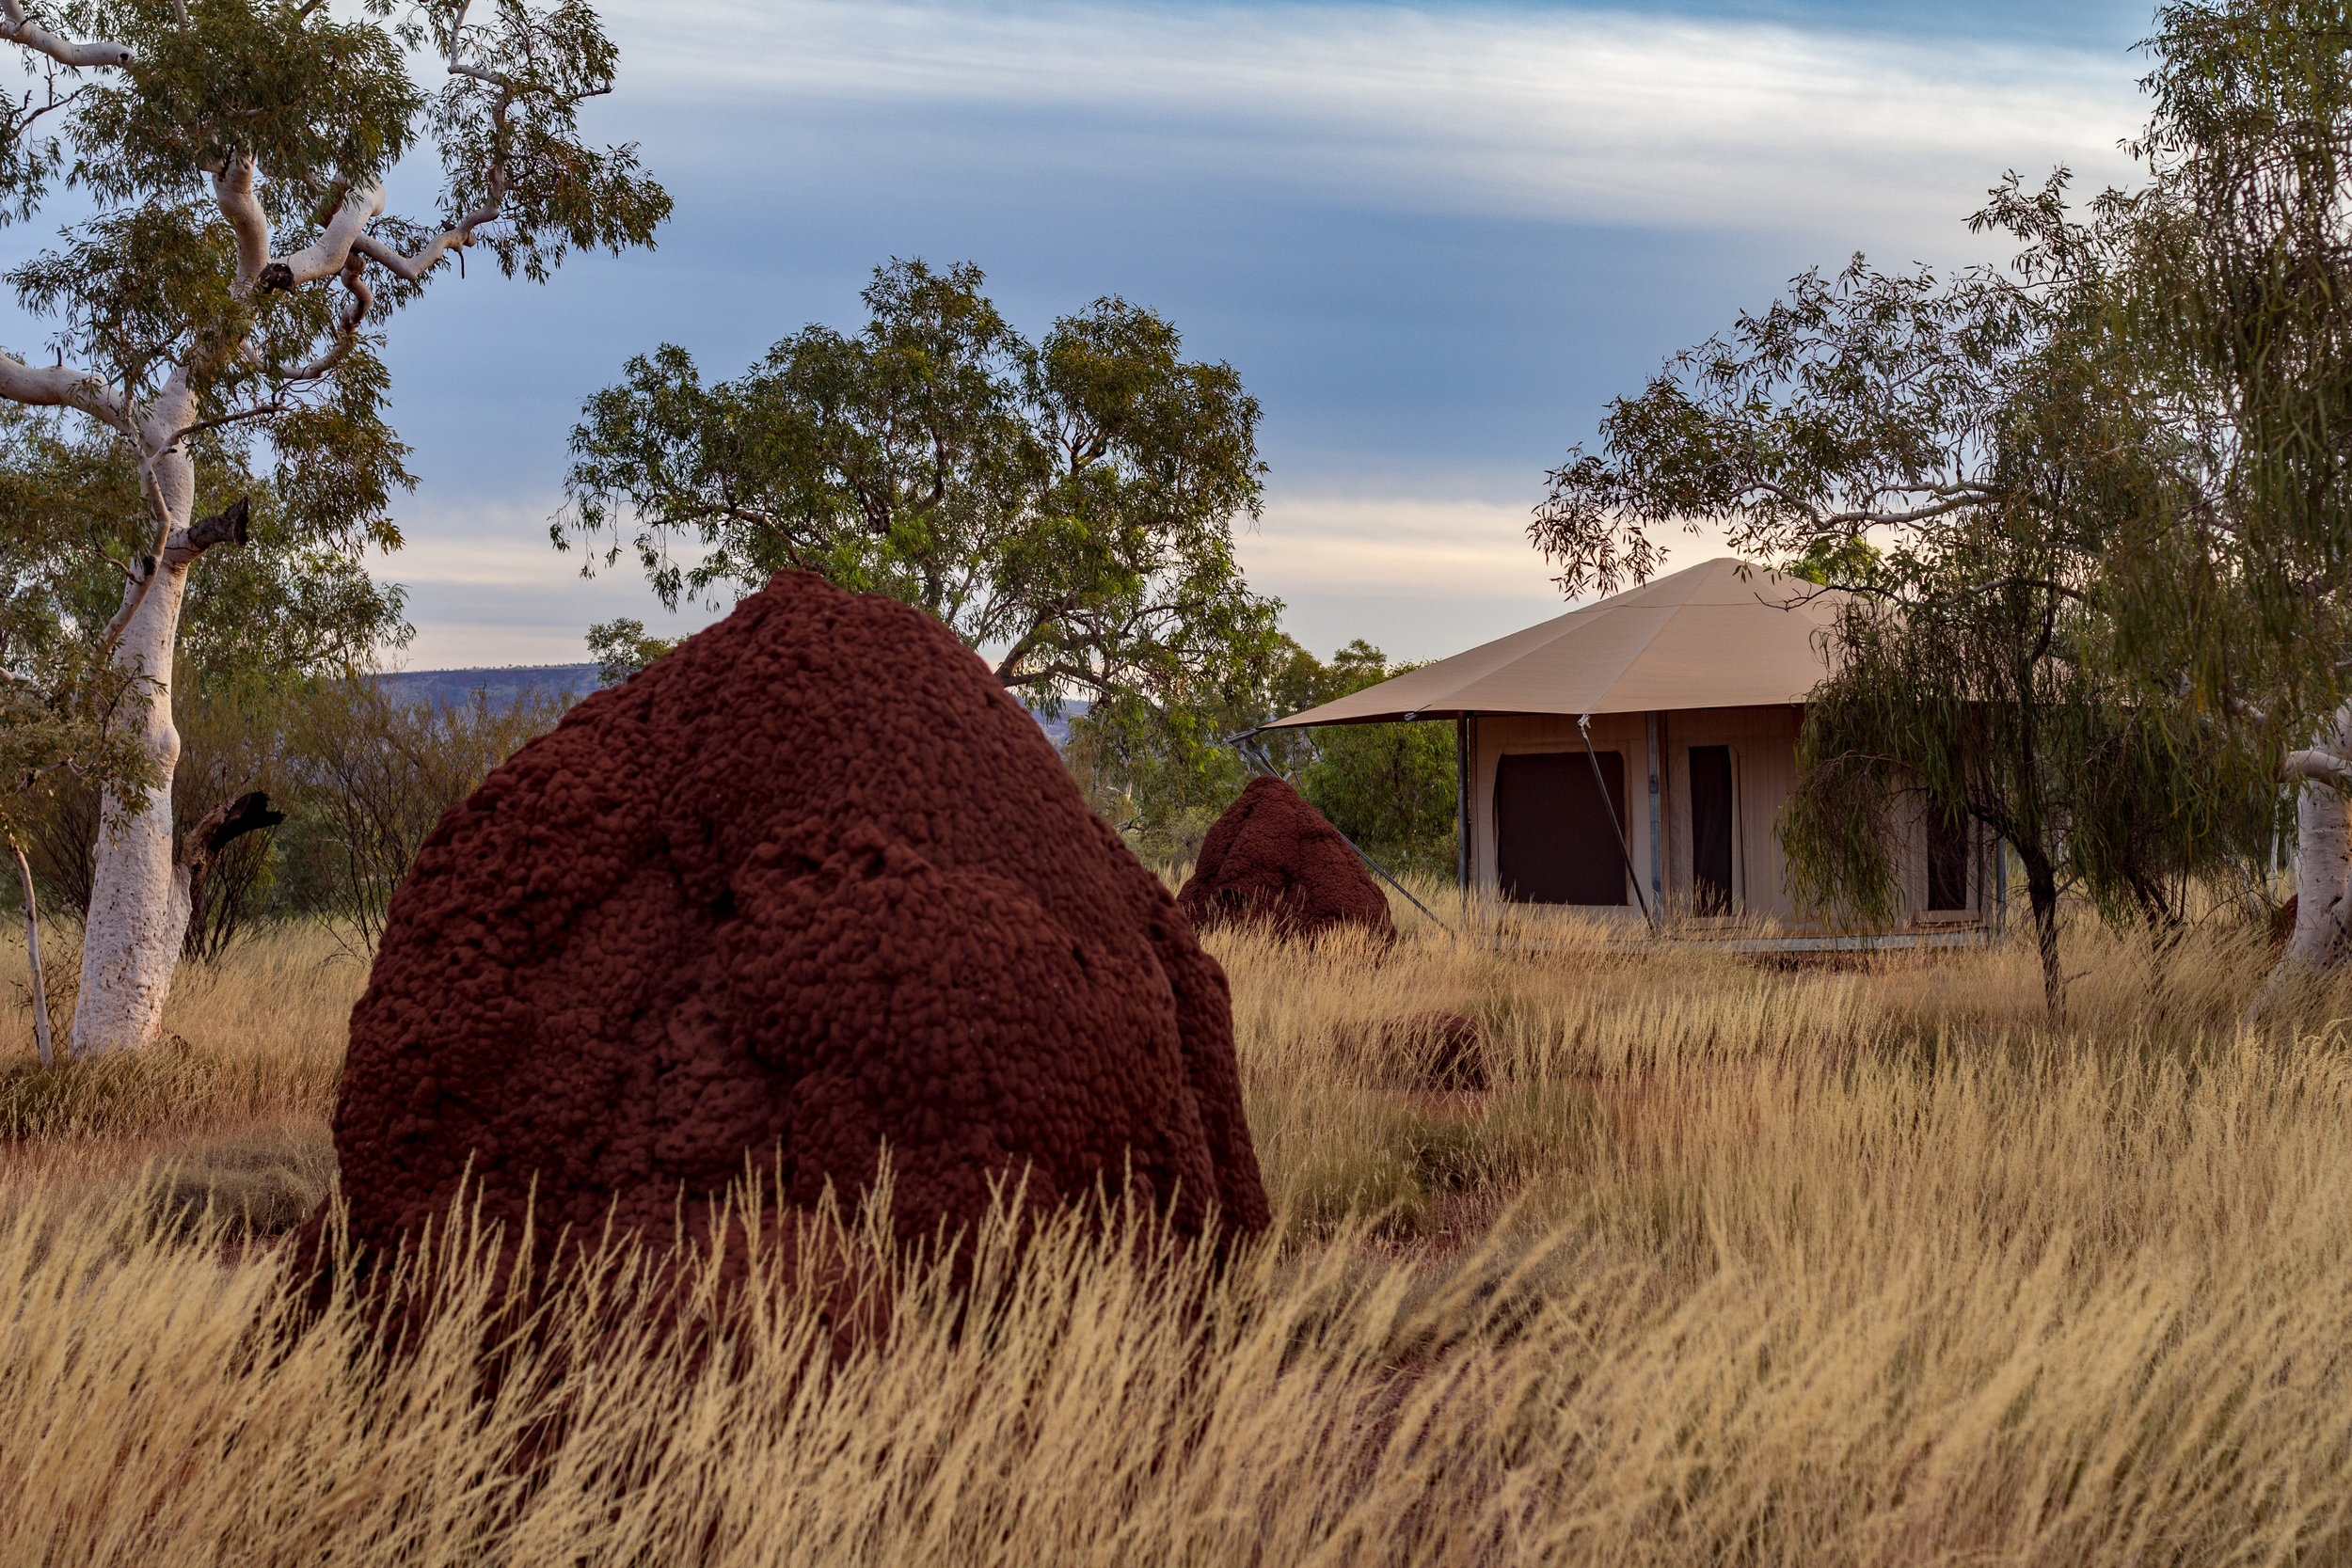 Huge termite mounts next to Eco Tents in Karijini National Park, Western Australia